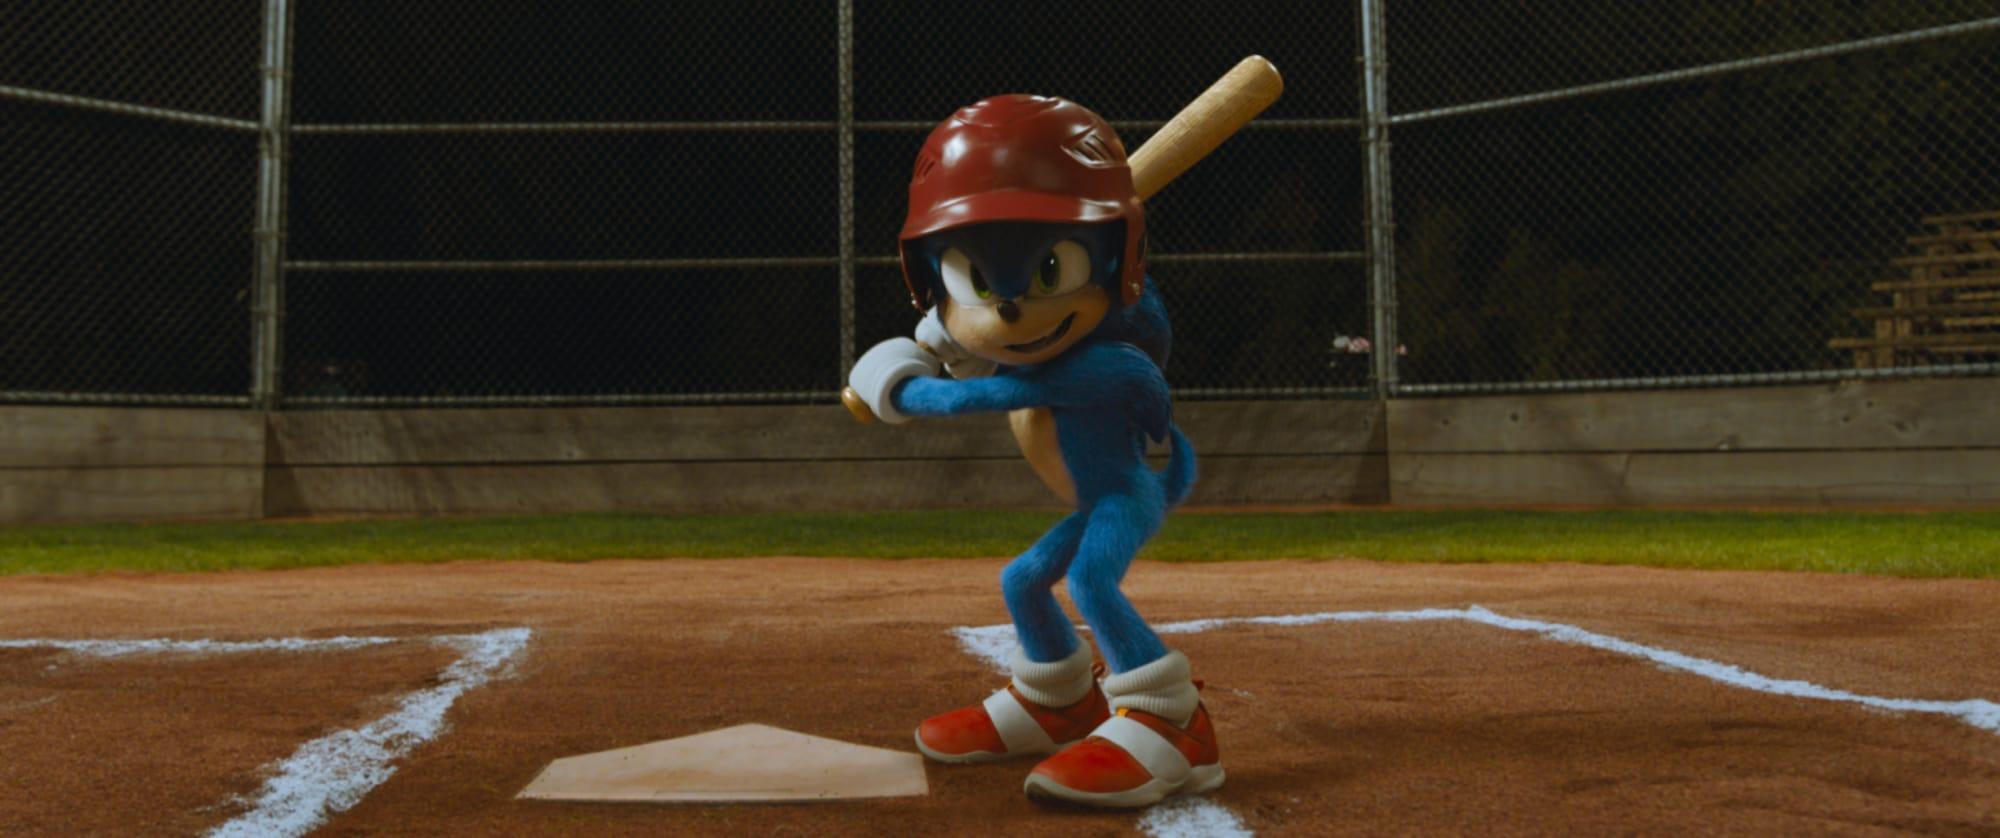 Will Sonic The Hedgehog Stream On Amazon Prime Video